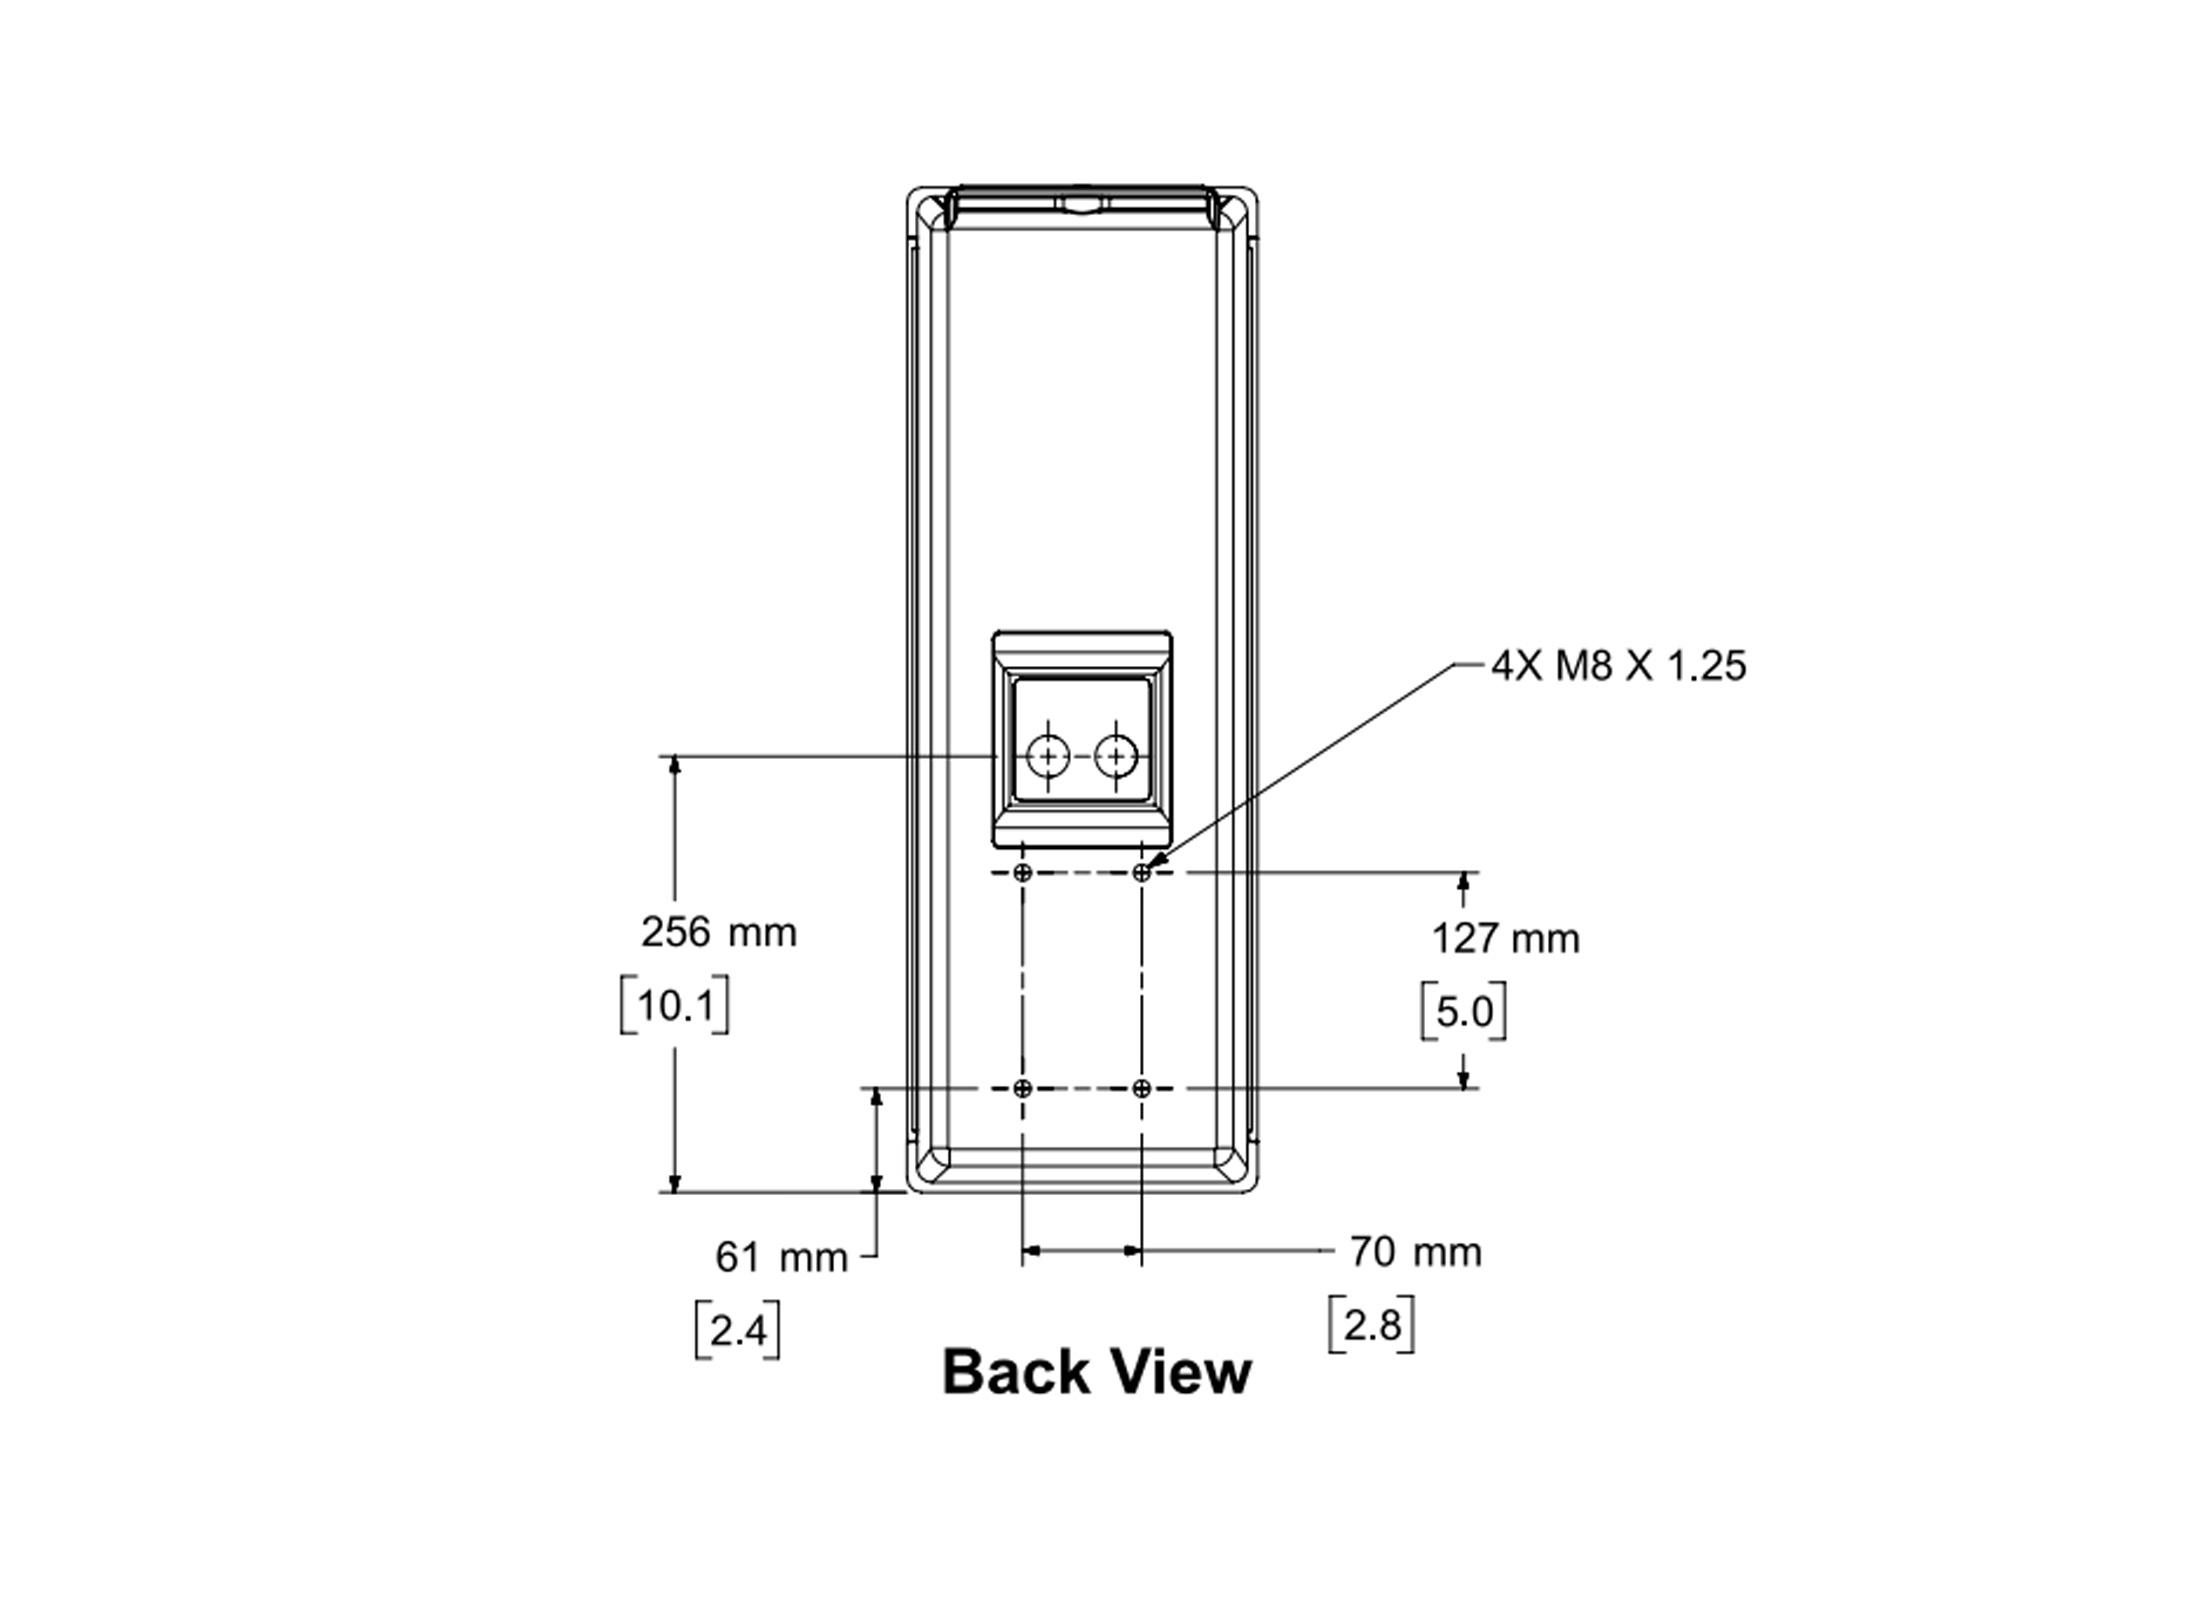 bose panaray 402 ii outdoor lautsprecher wei g nstig. Black Bedroom Furniture Sets. Home Design Ideas